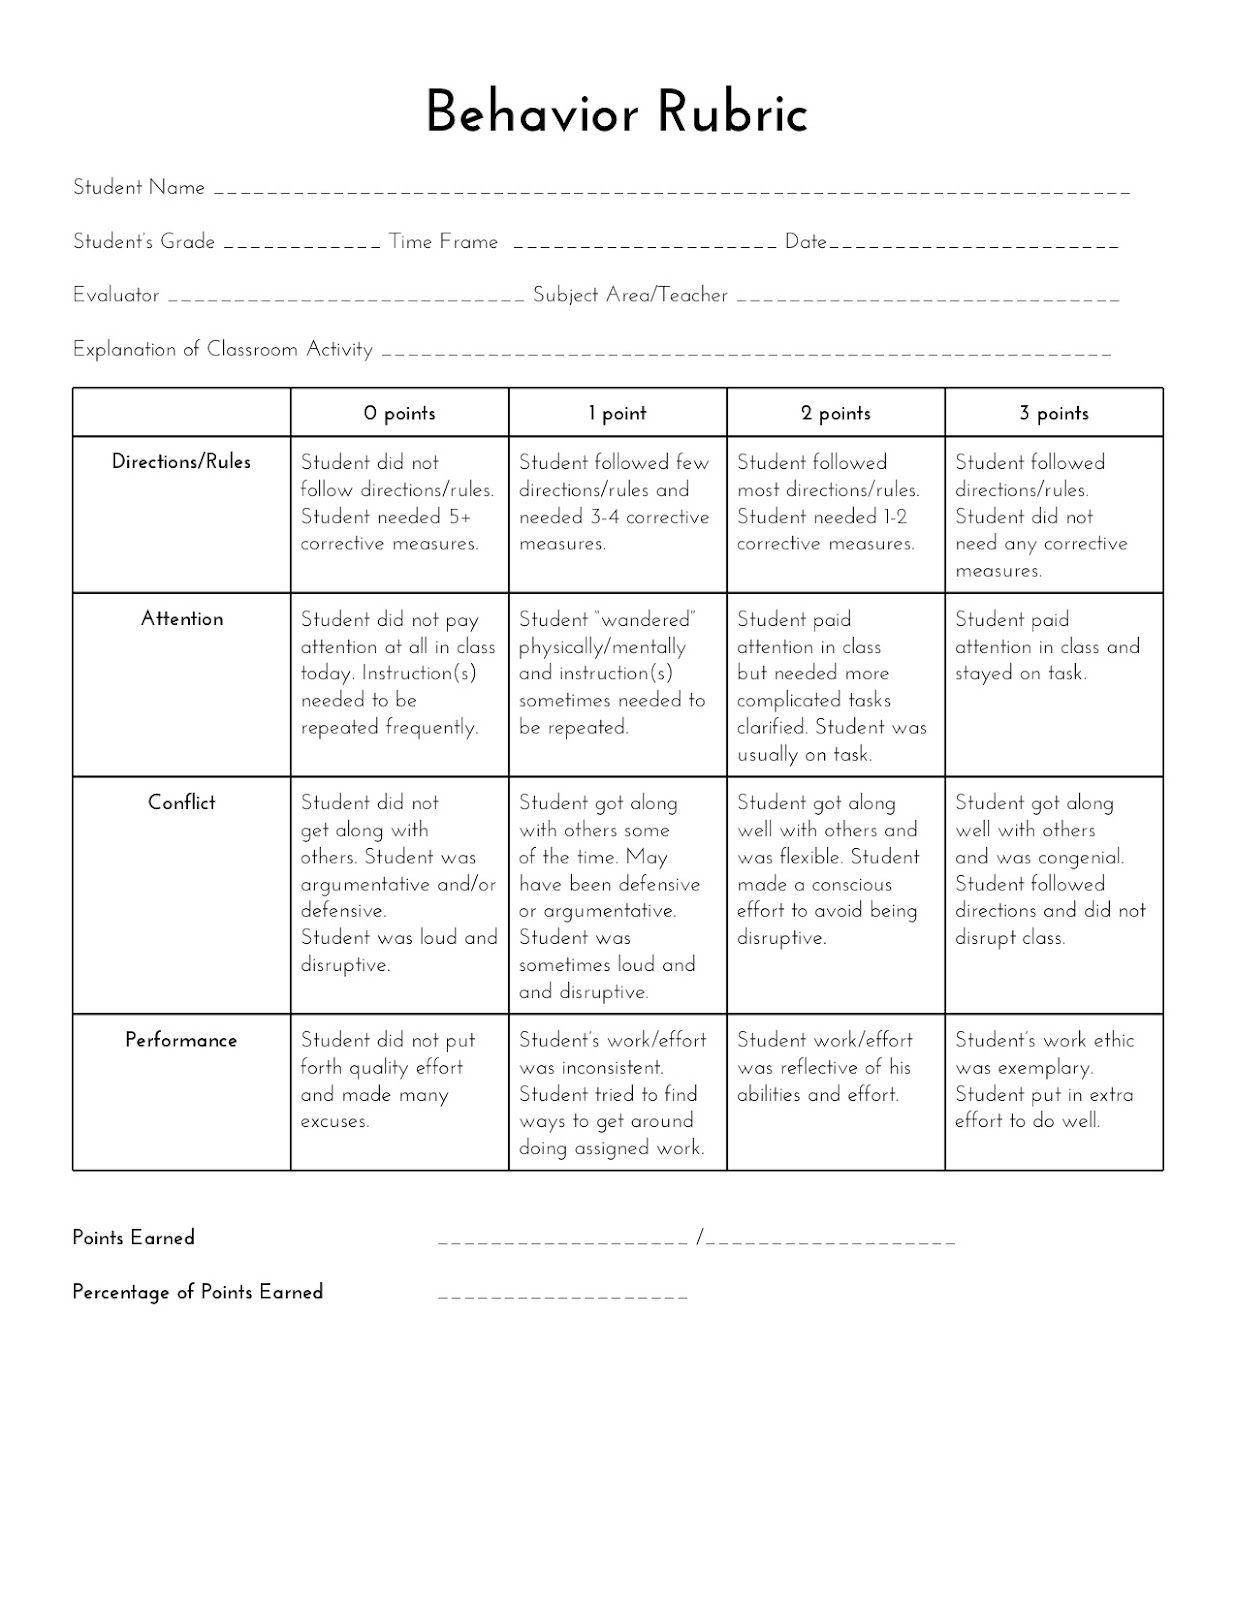 Rules against teachers dating parents